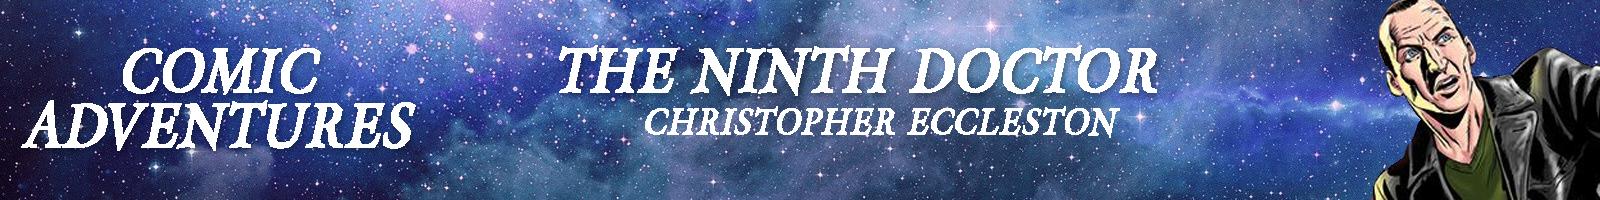 The Ninth Doctor Comics